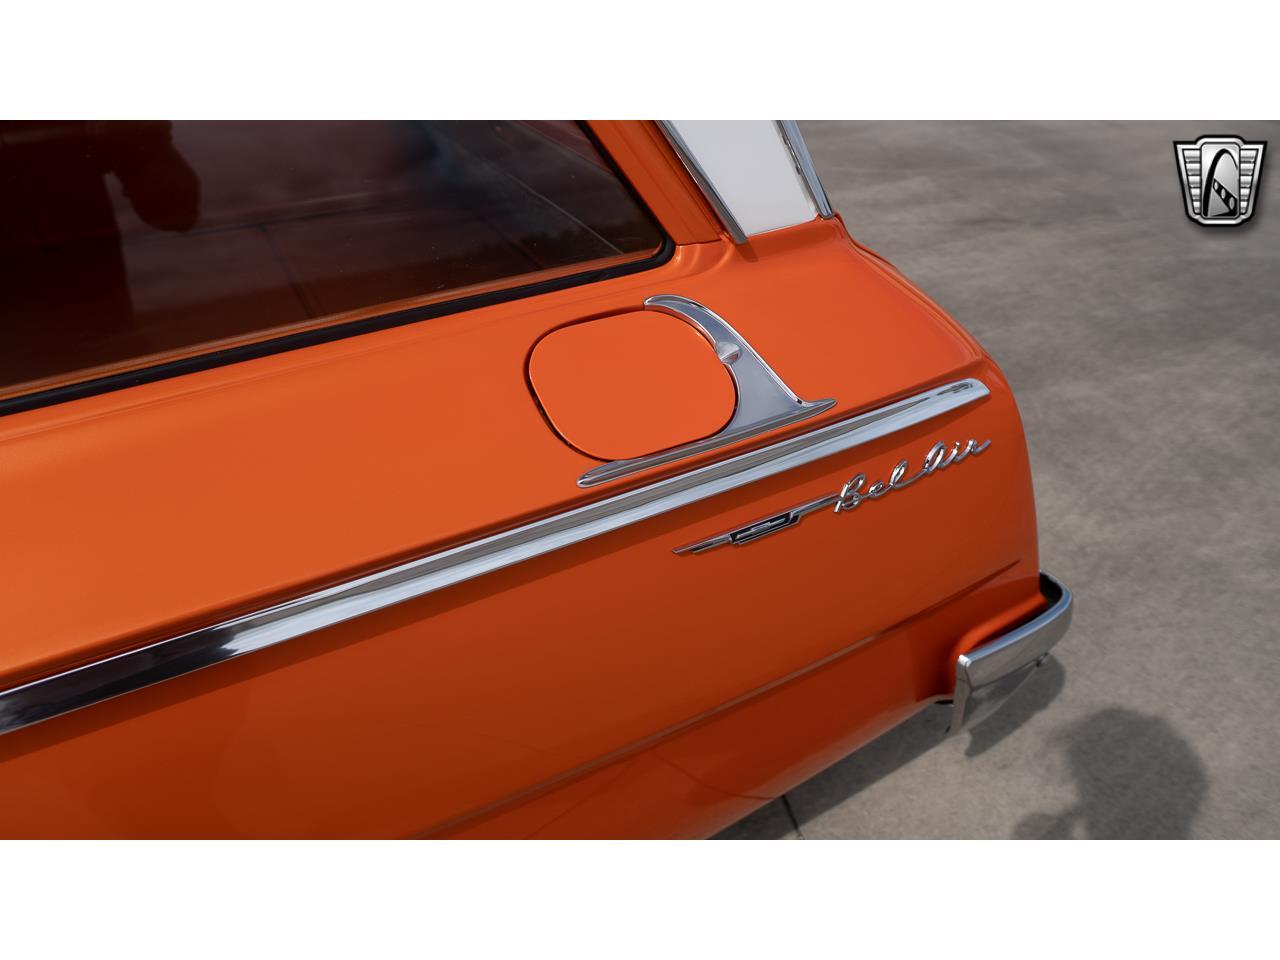 1962 Chevrolet Bel Air (CC-1342888) for sale in O'Fallon, Illinois